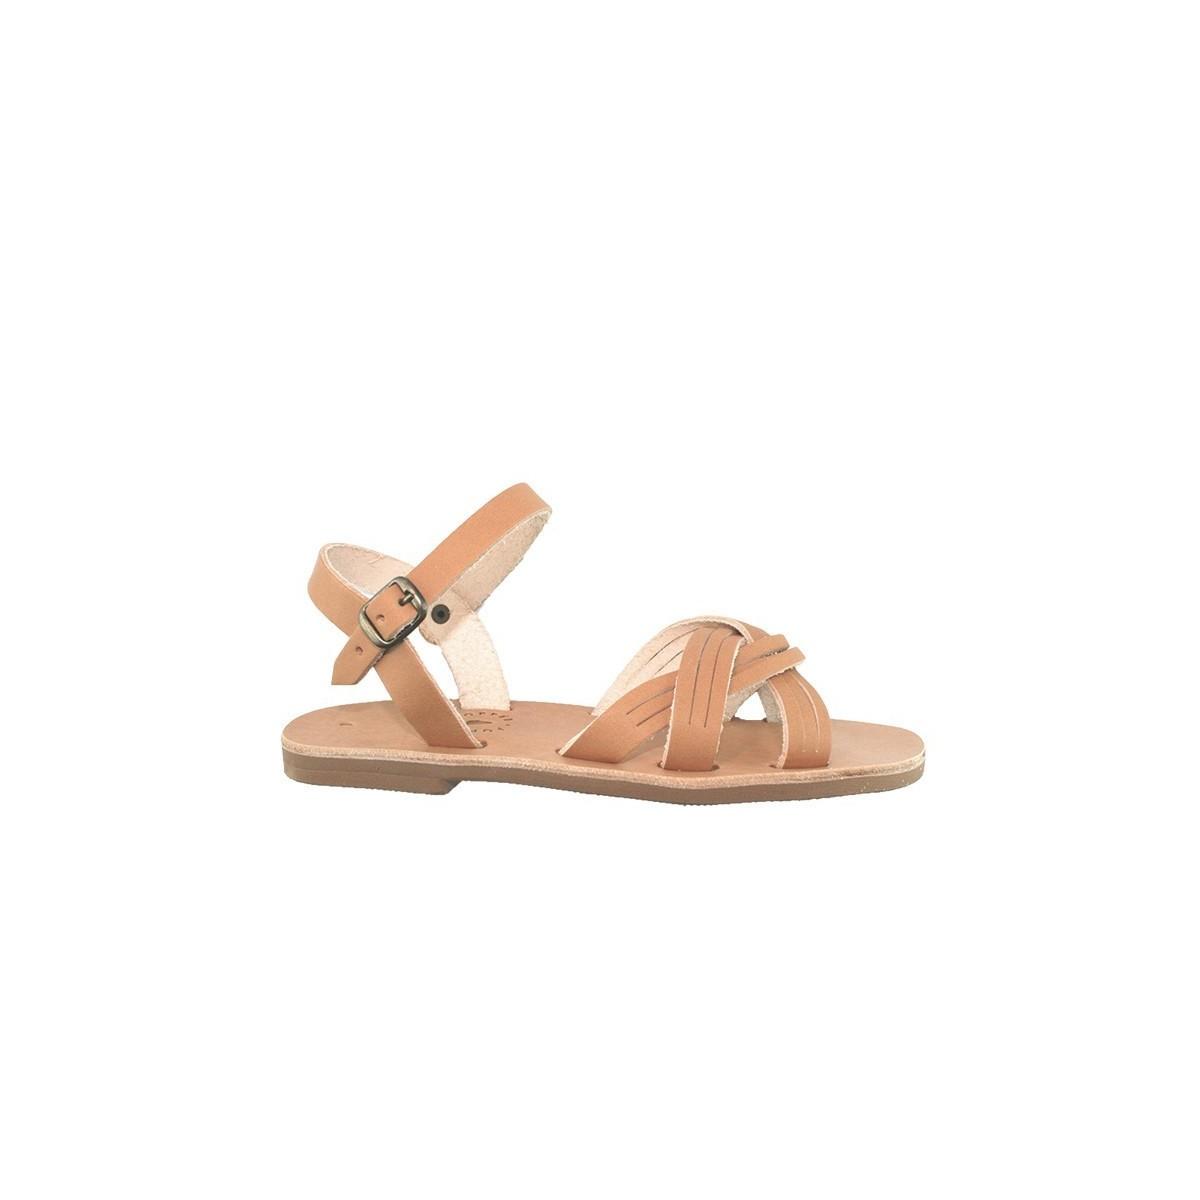 Sandale Grecque Kea Naturel